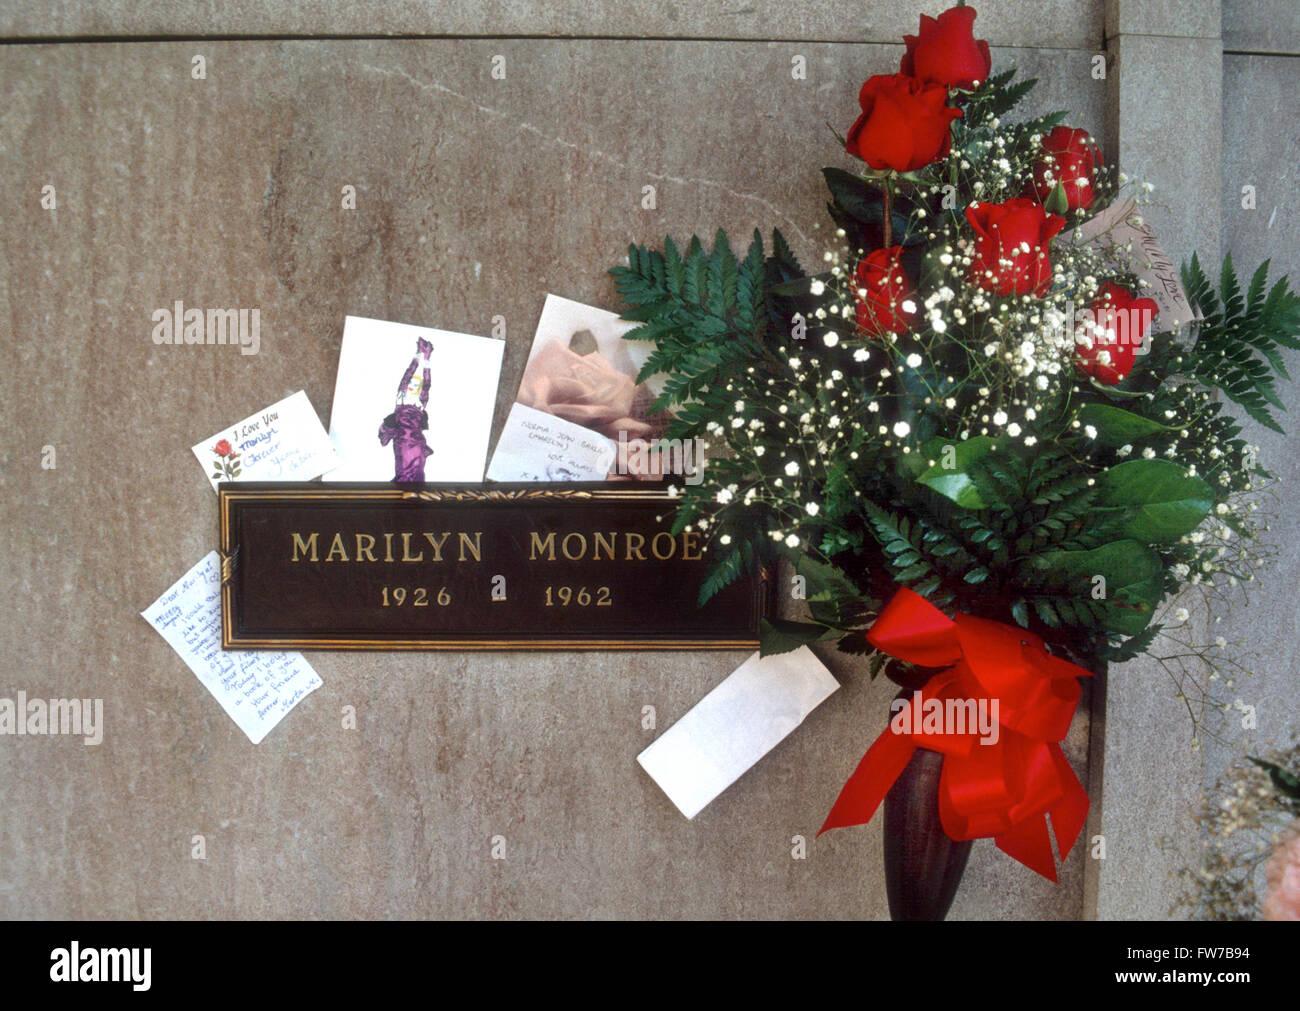 MARILYN MONROE actress grave - Stock Image